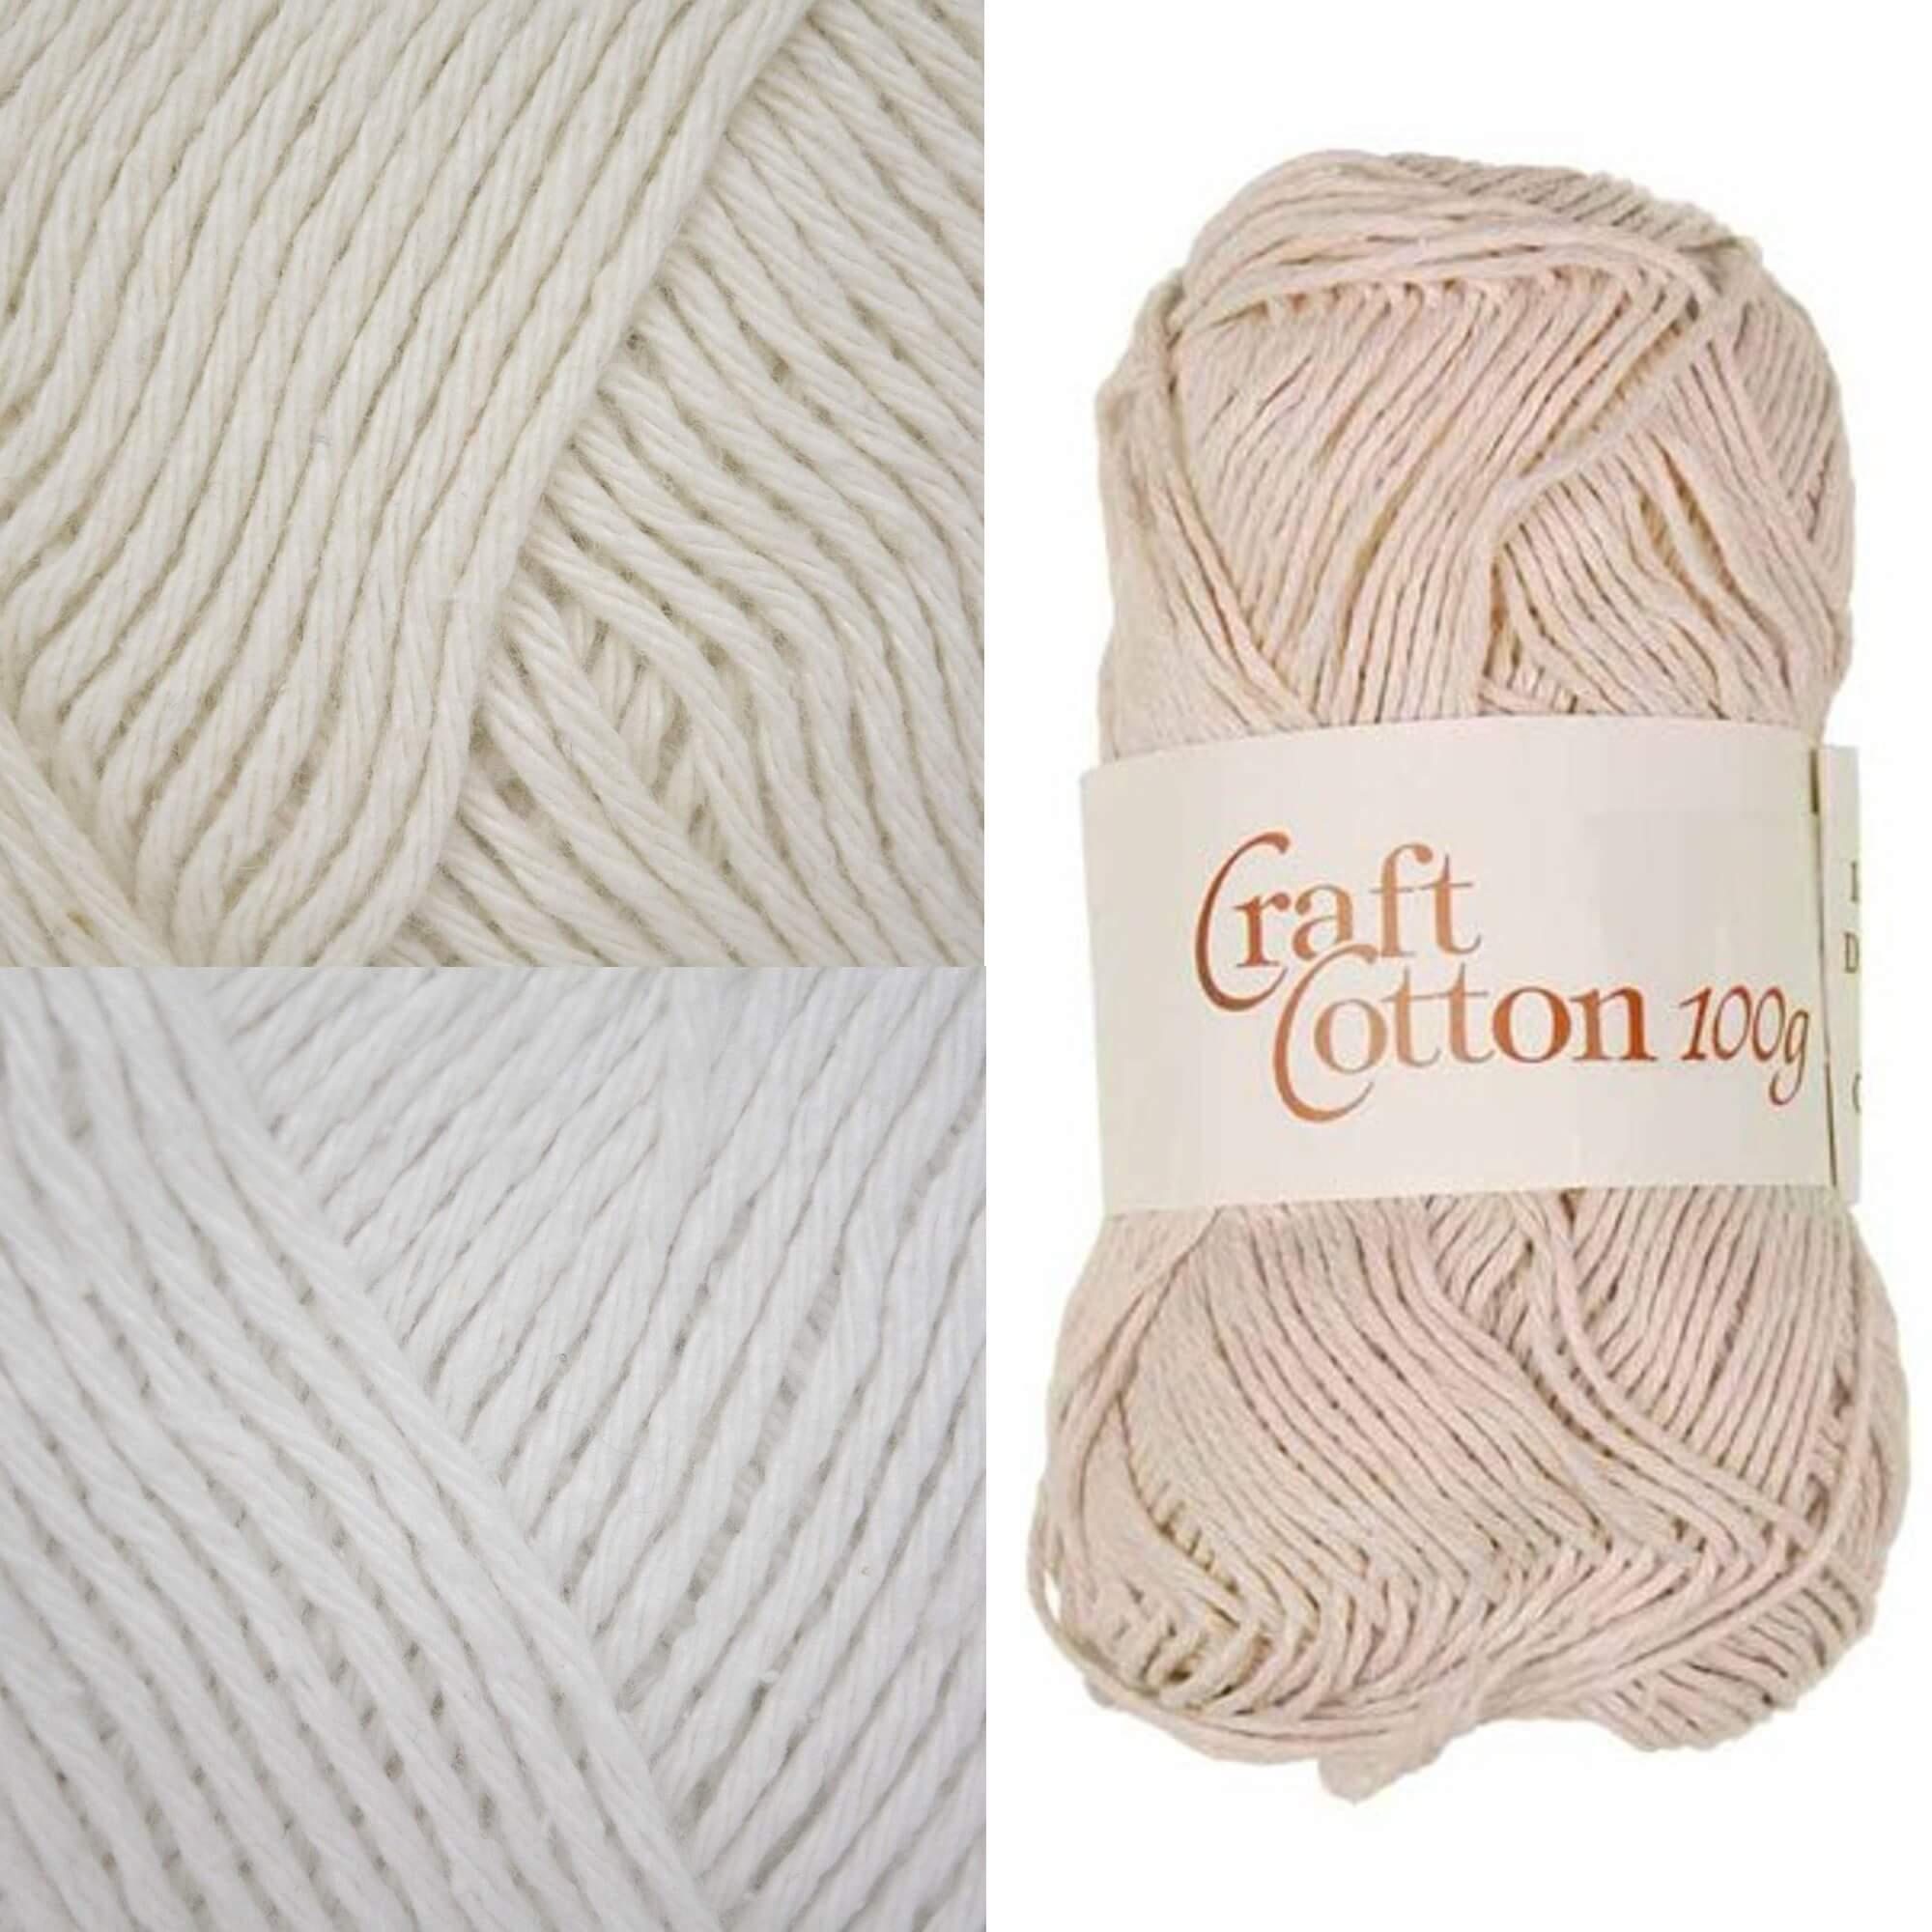 James C Brett Craft Cotton 100% Cotton Yarn 100g Ball Knitting Yarn Knit Craft ECRU